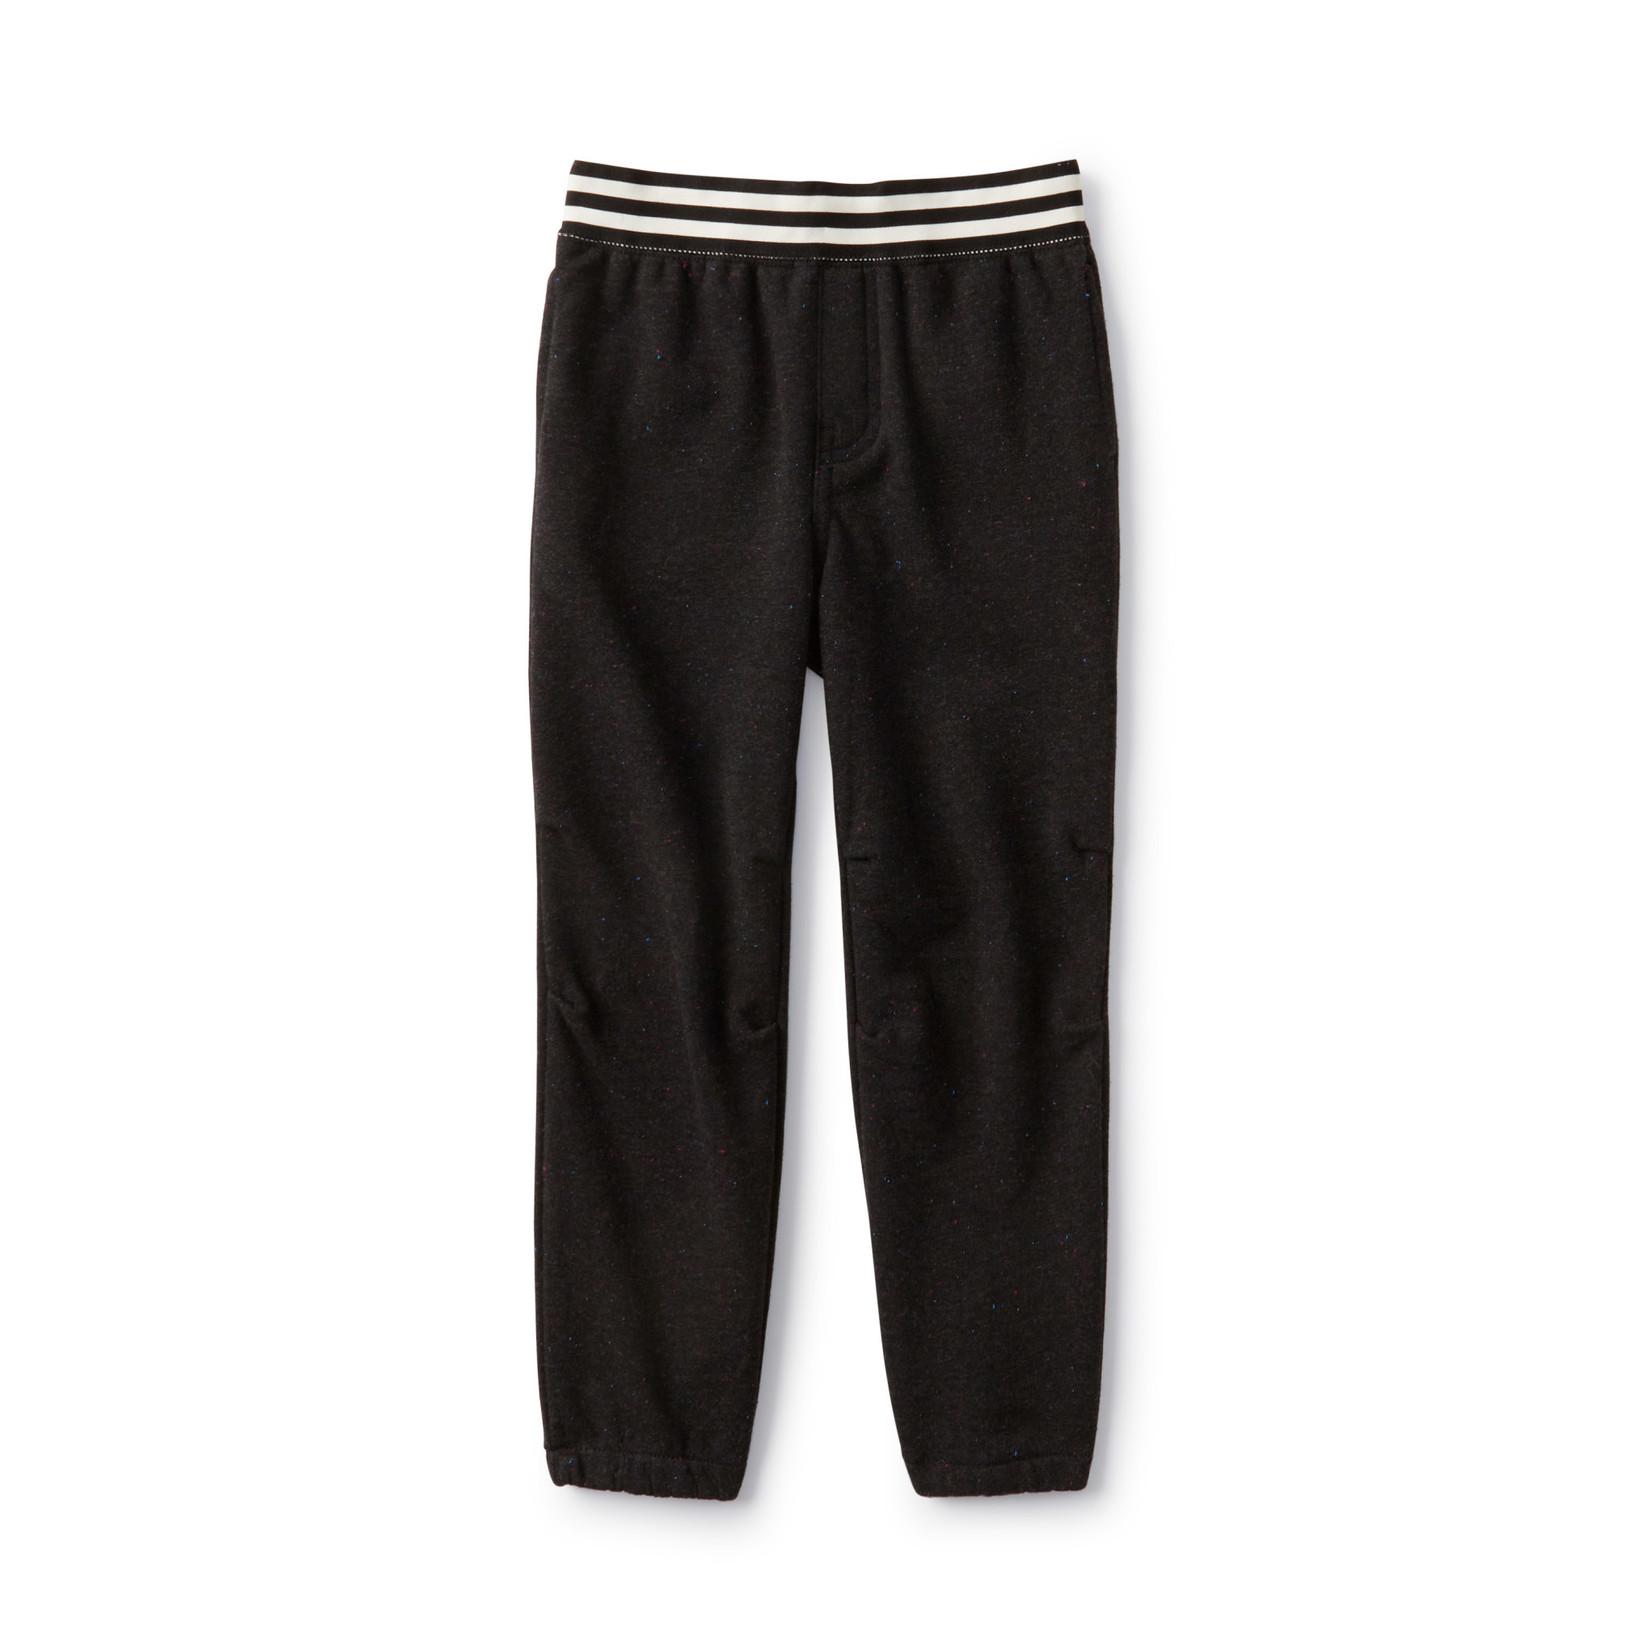 Tea Collection Dressed Up Stripe Sweatpants - Jet Black